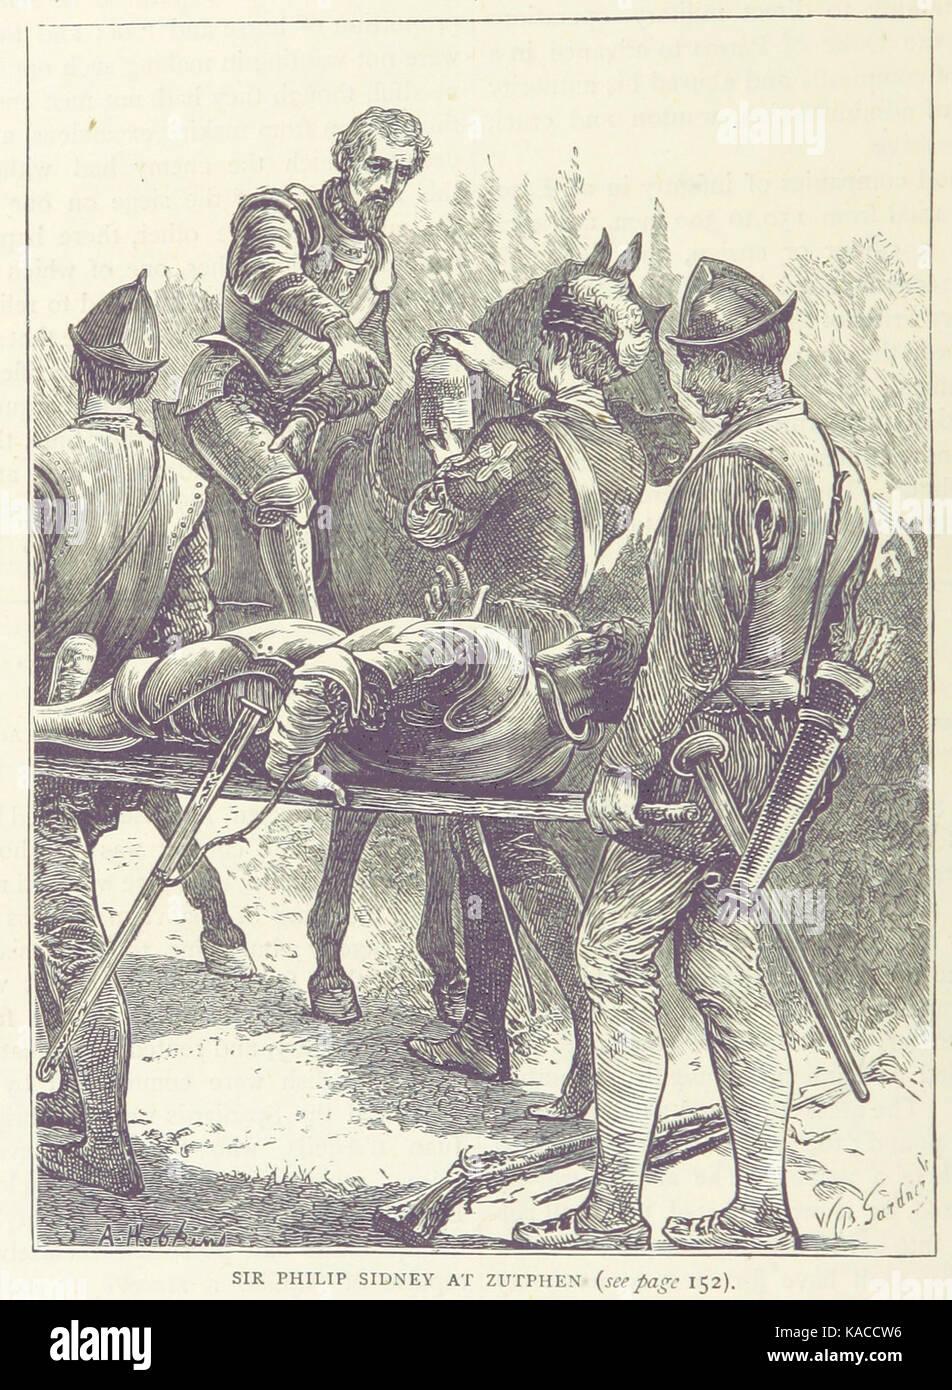 Sir Philip Sidney at Zutphen - Stock Image